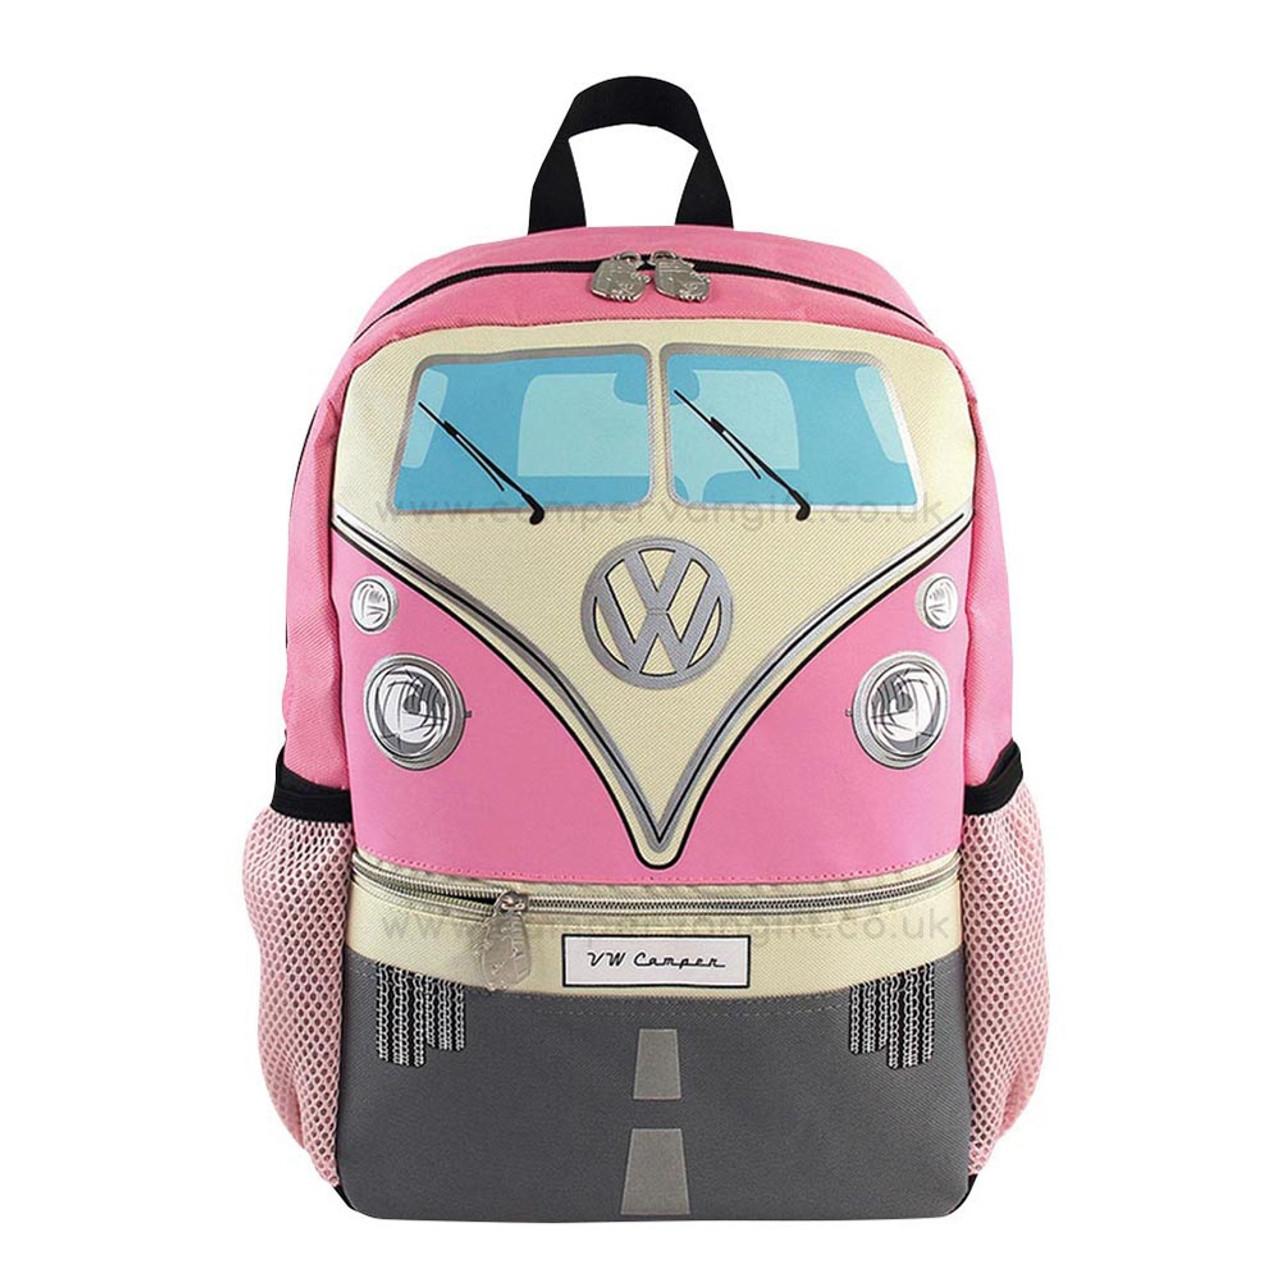 Volkswagen Front Campervan T1 Small Backpack - Idea School Bag for ... 153ffddf1a66f